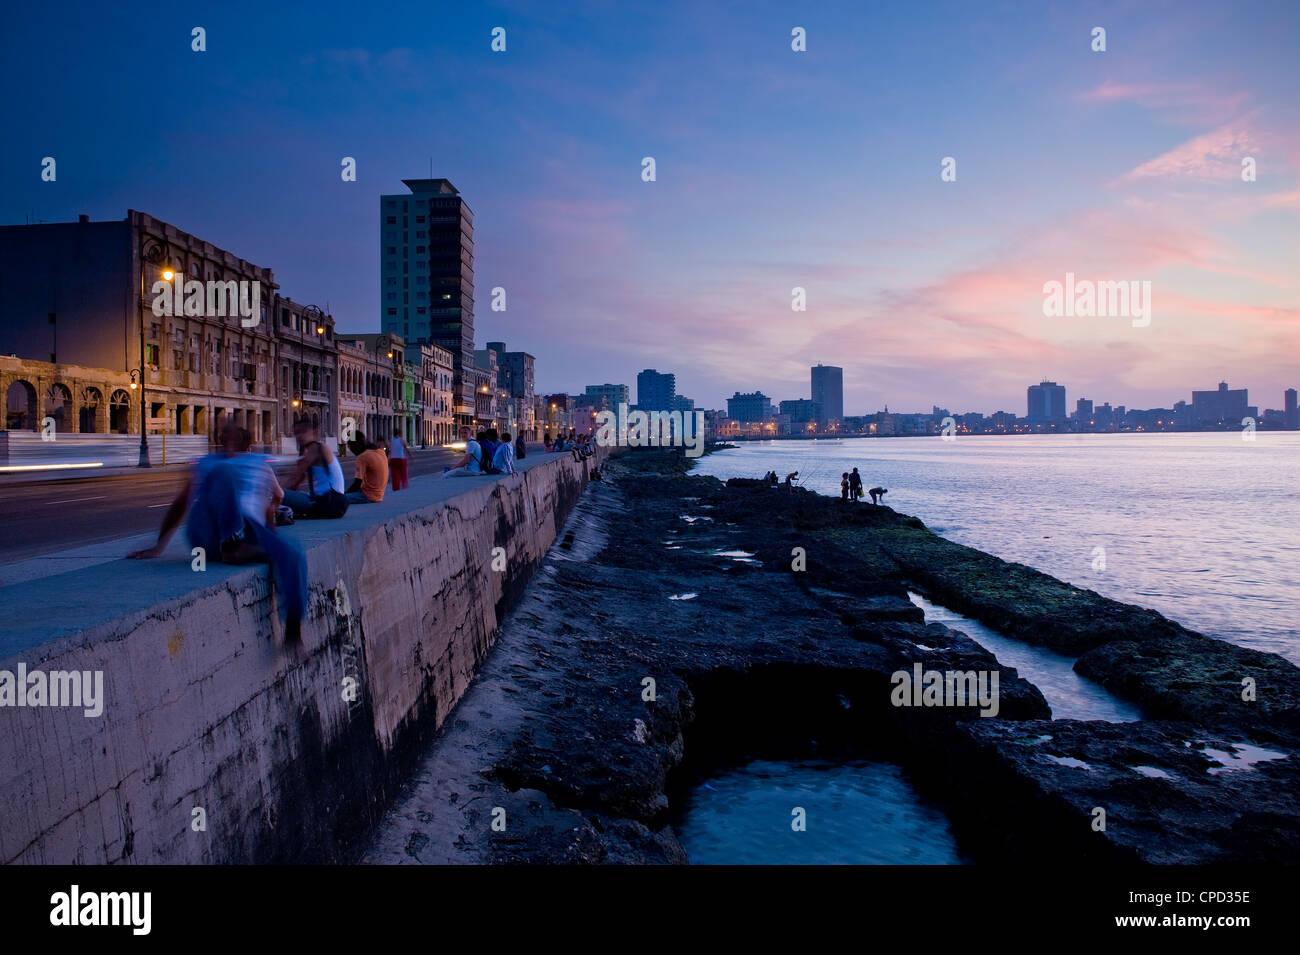 Der Malecon, Havanna, Kuba, Karibik, Mittelamerika Stockbild